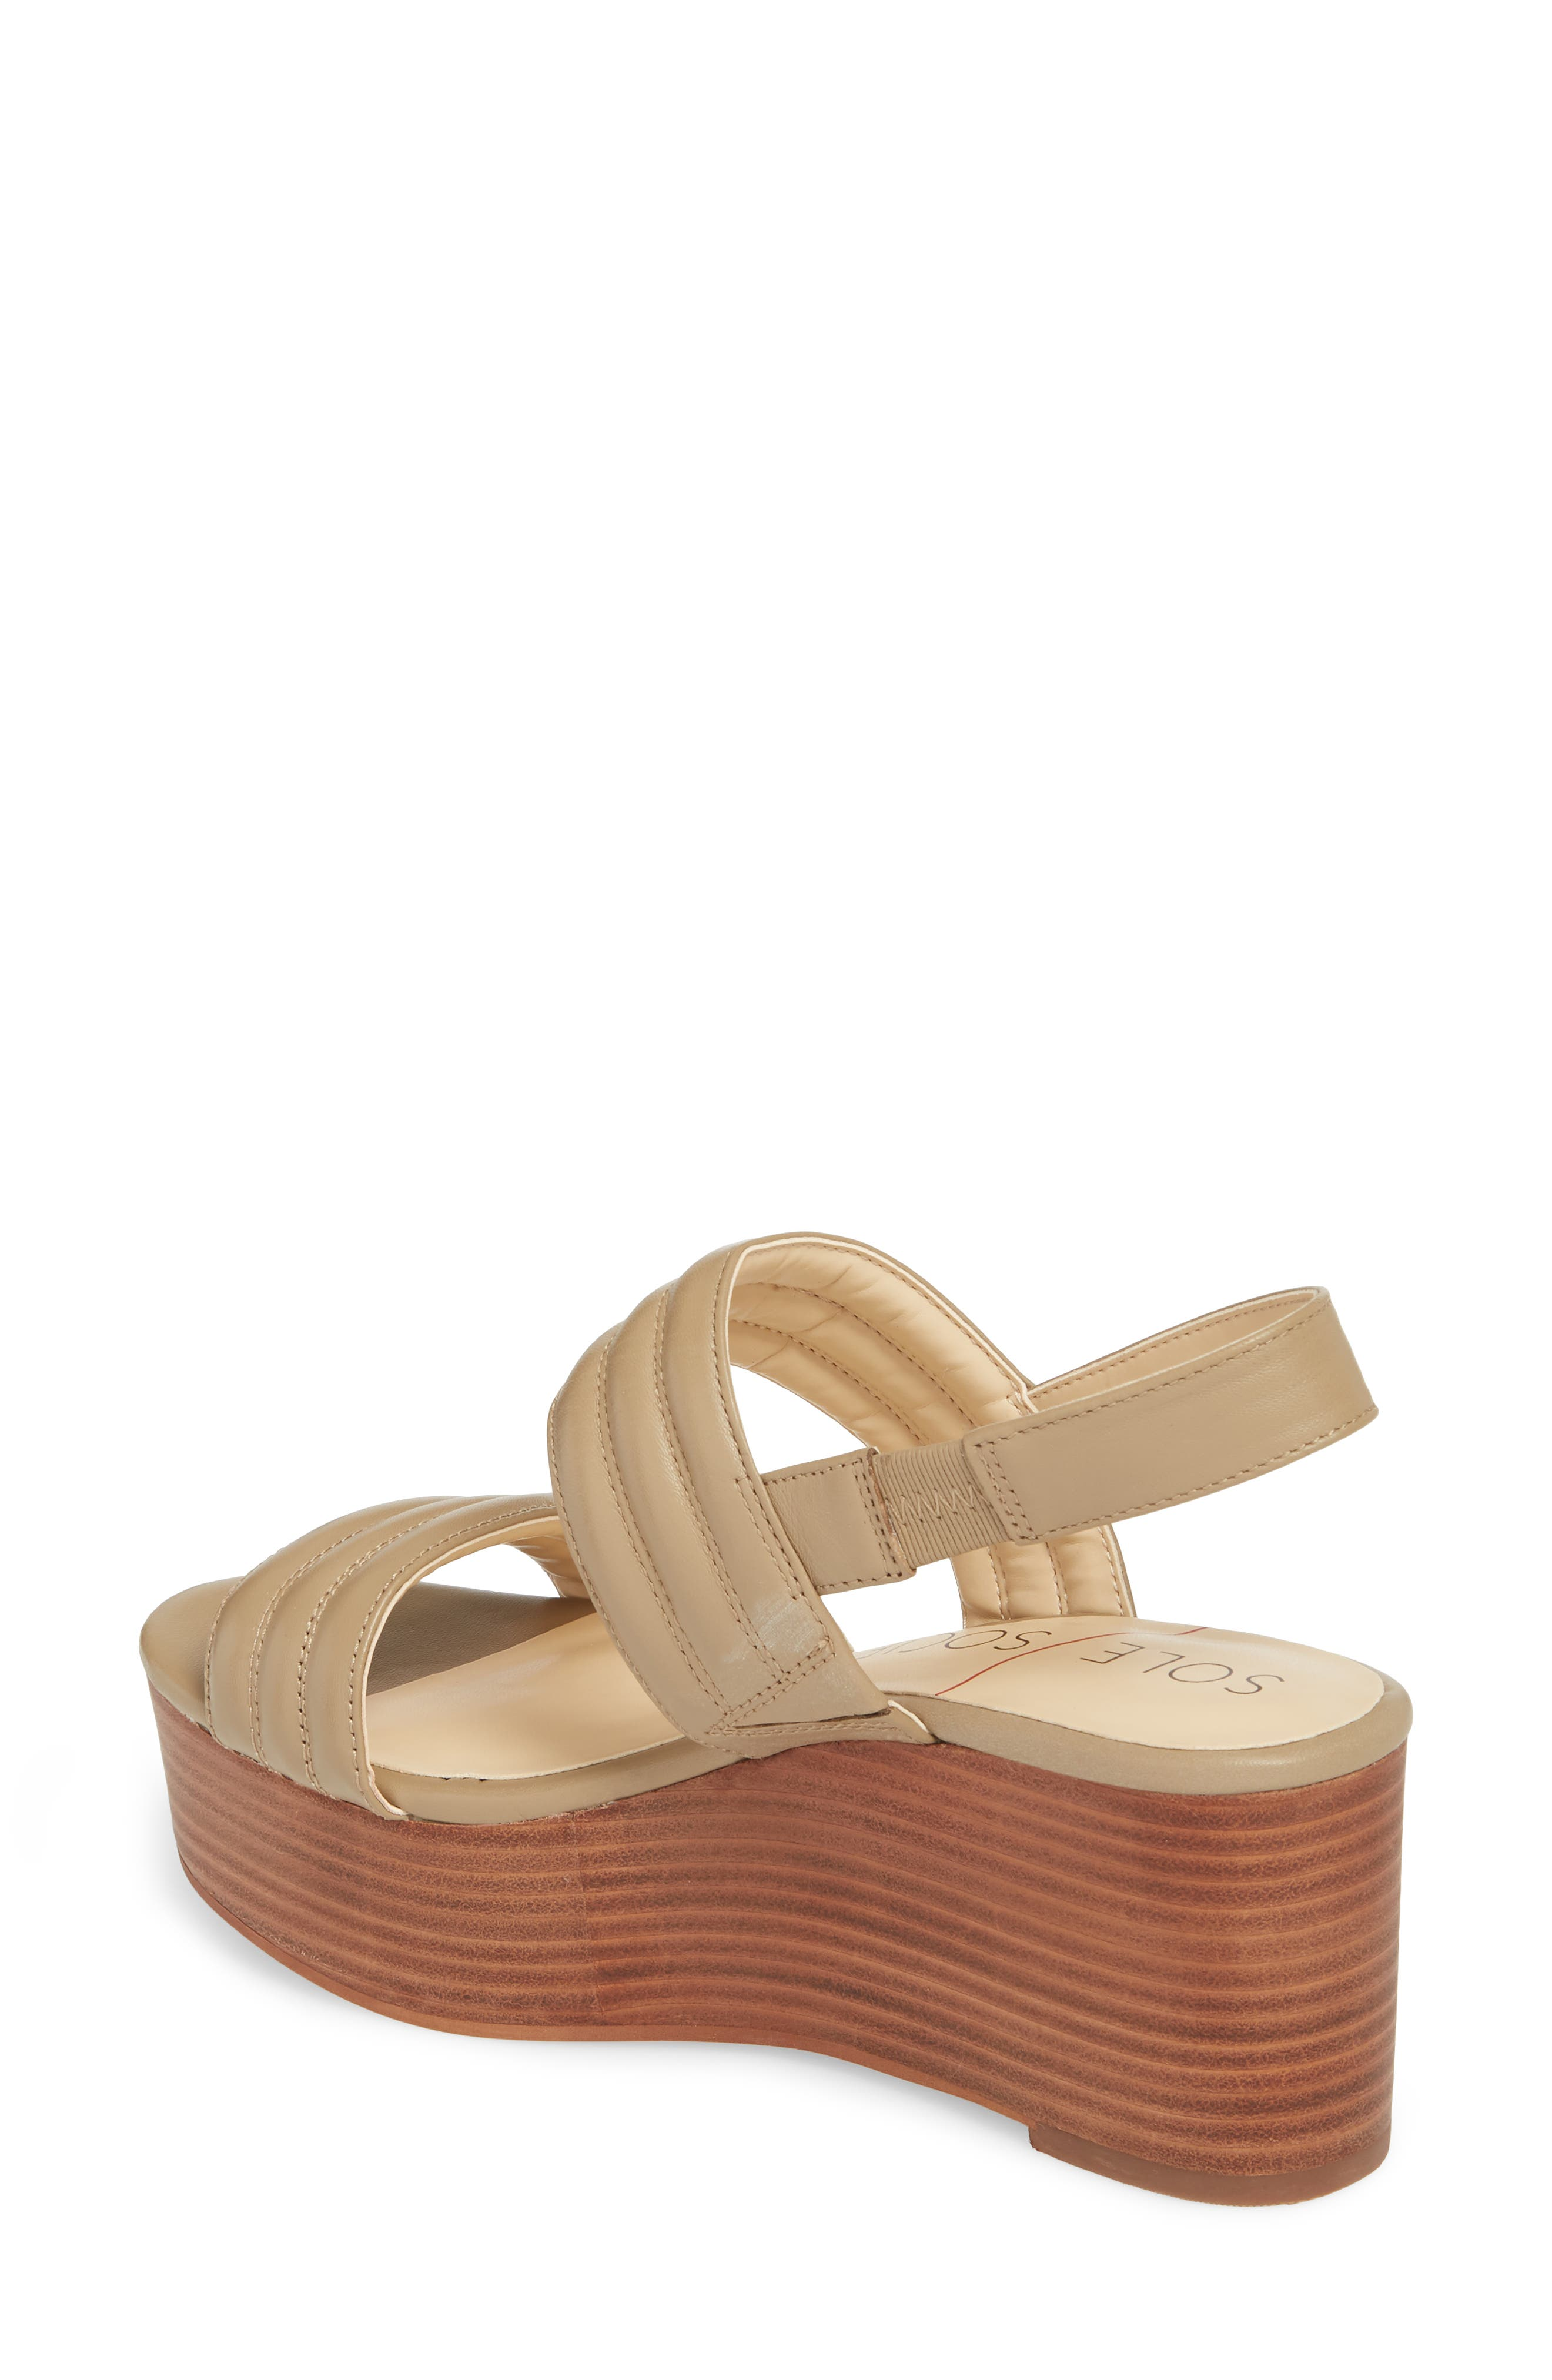 Amberly Platform Sandal,                             Alternate thumbnail 2, color,                             Night Taupe